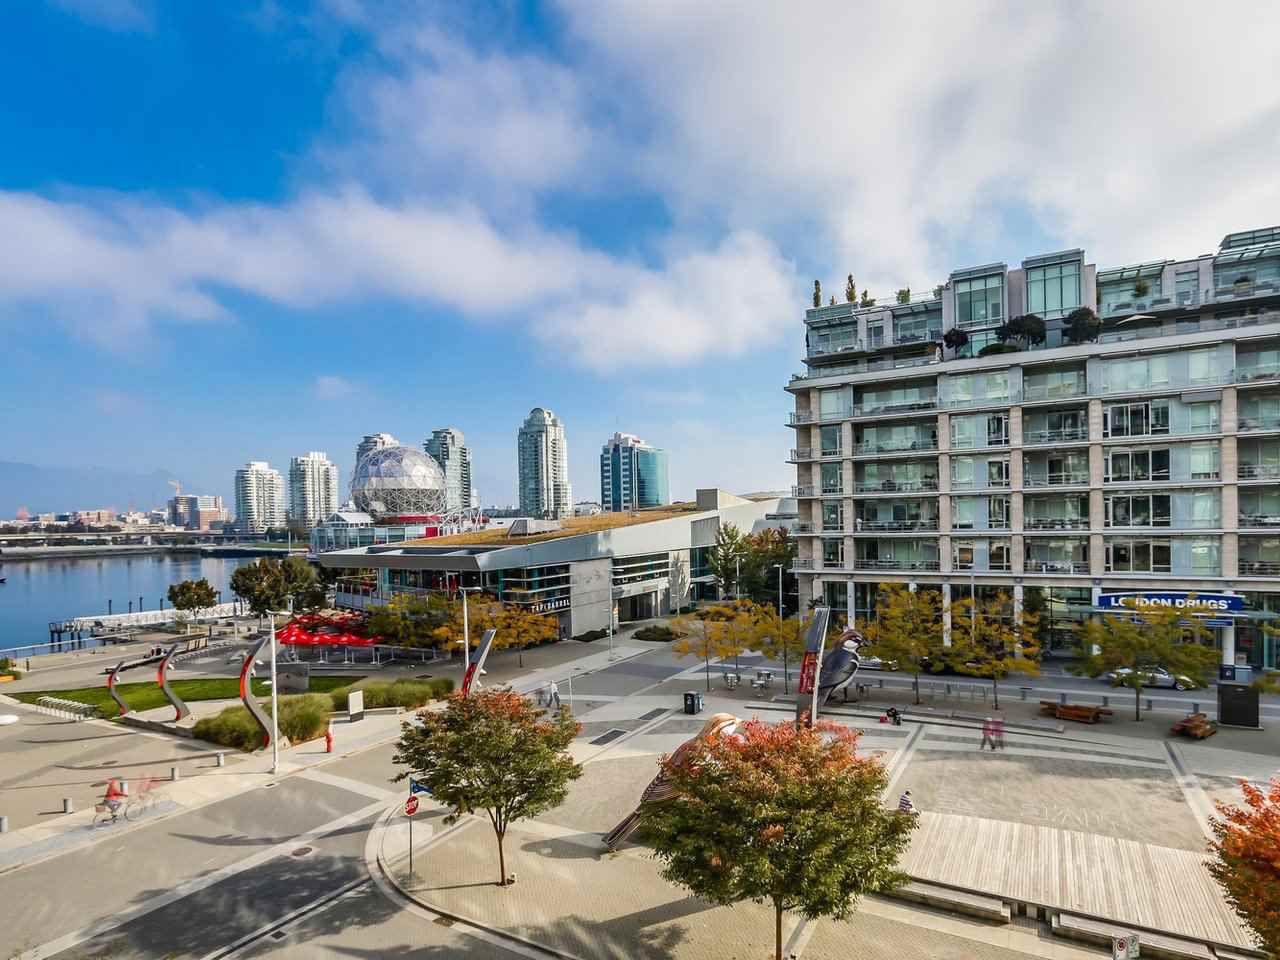 "Main Photo: 402 1625 MANITOBA Street in Vancouver: False Creek Condo for sale in ""SHORELINE"" (Vancouver West)  : MLS®# R2292744"